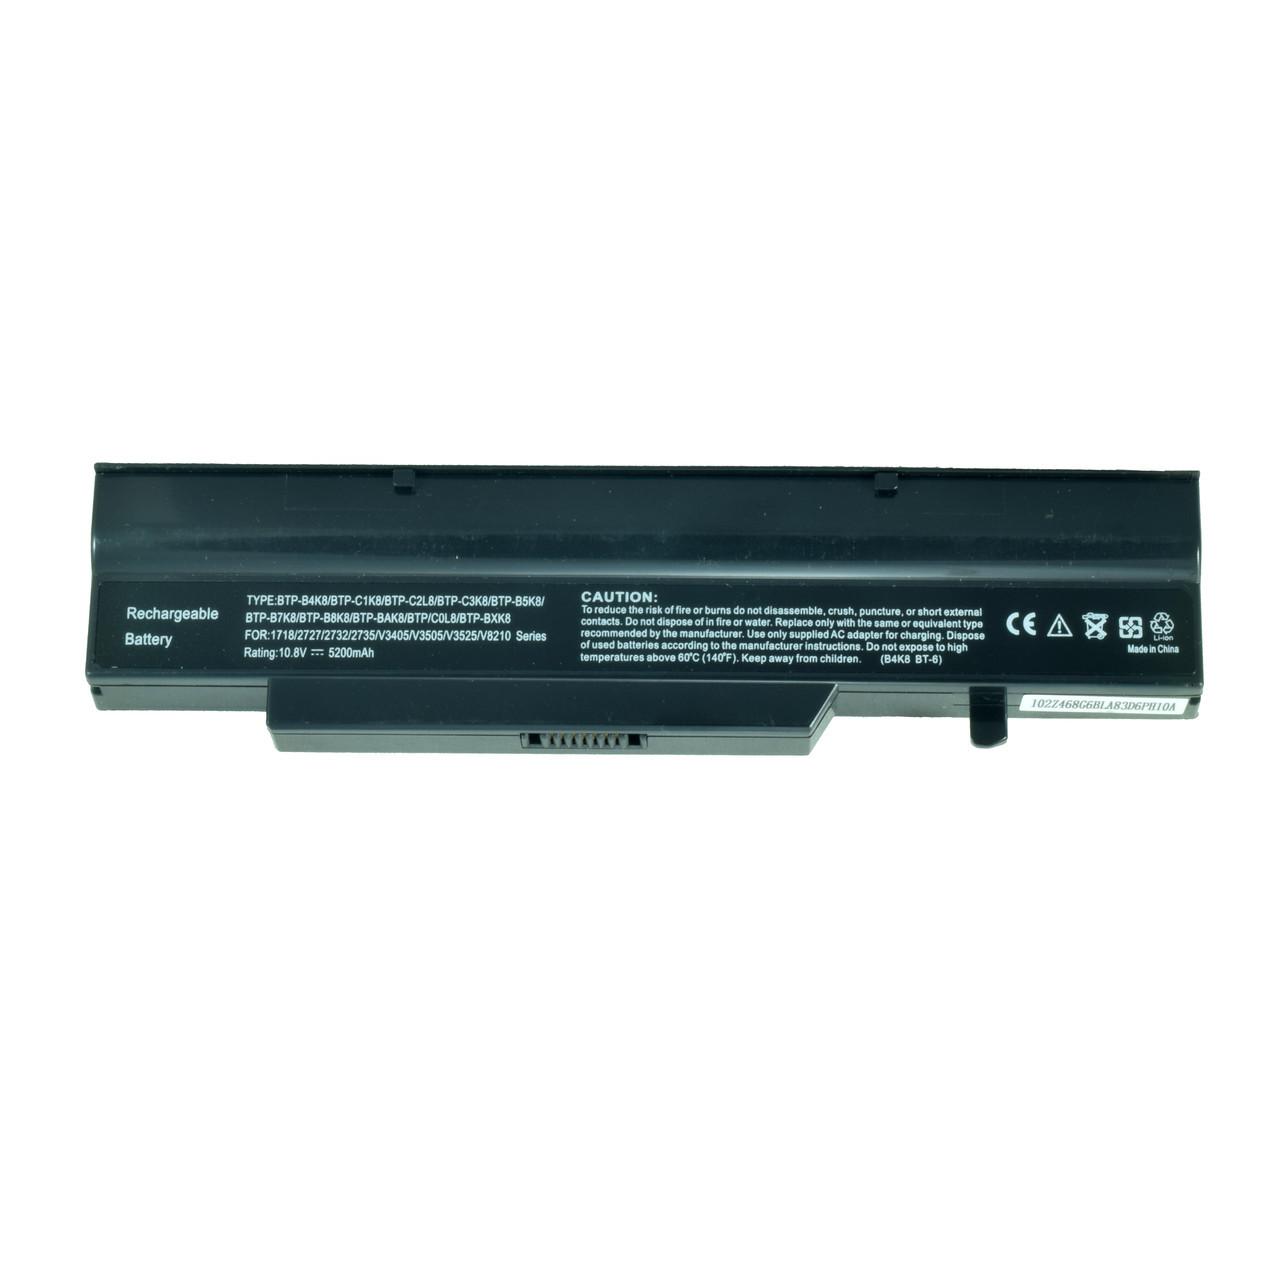 Батарея для ноутбука FUJITSU SIEMENS BTP-B4K8 BTP-B5K8. BTP-B7K8 BTP-B8K8 BTP-BAK8 BTP-C0K8